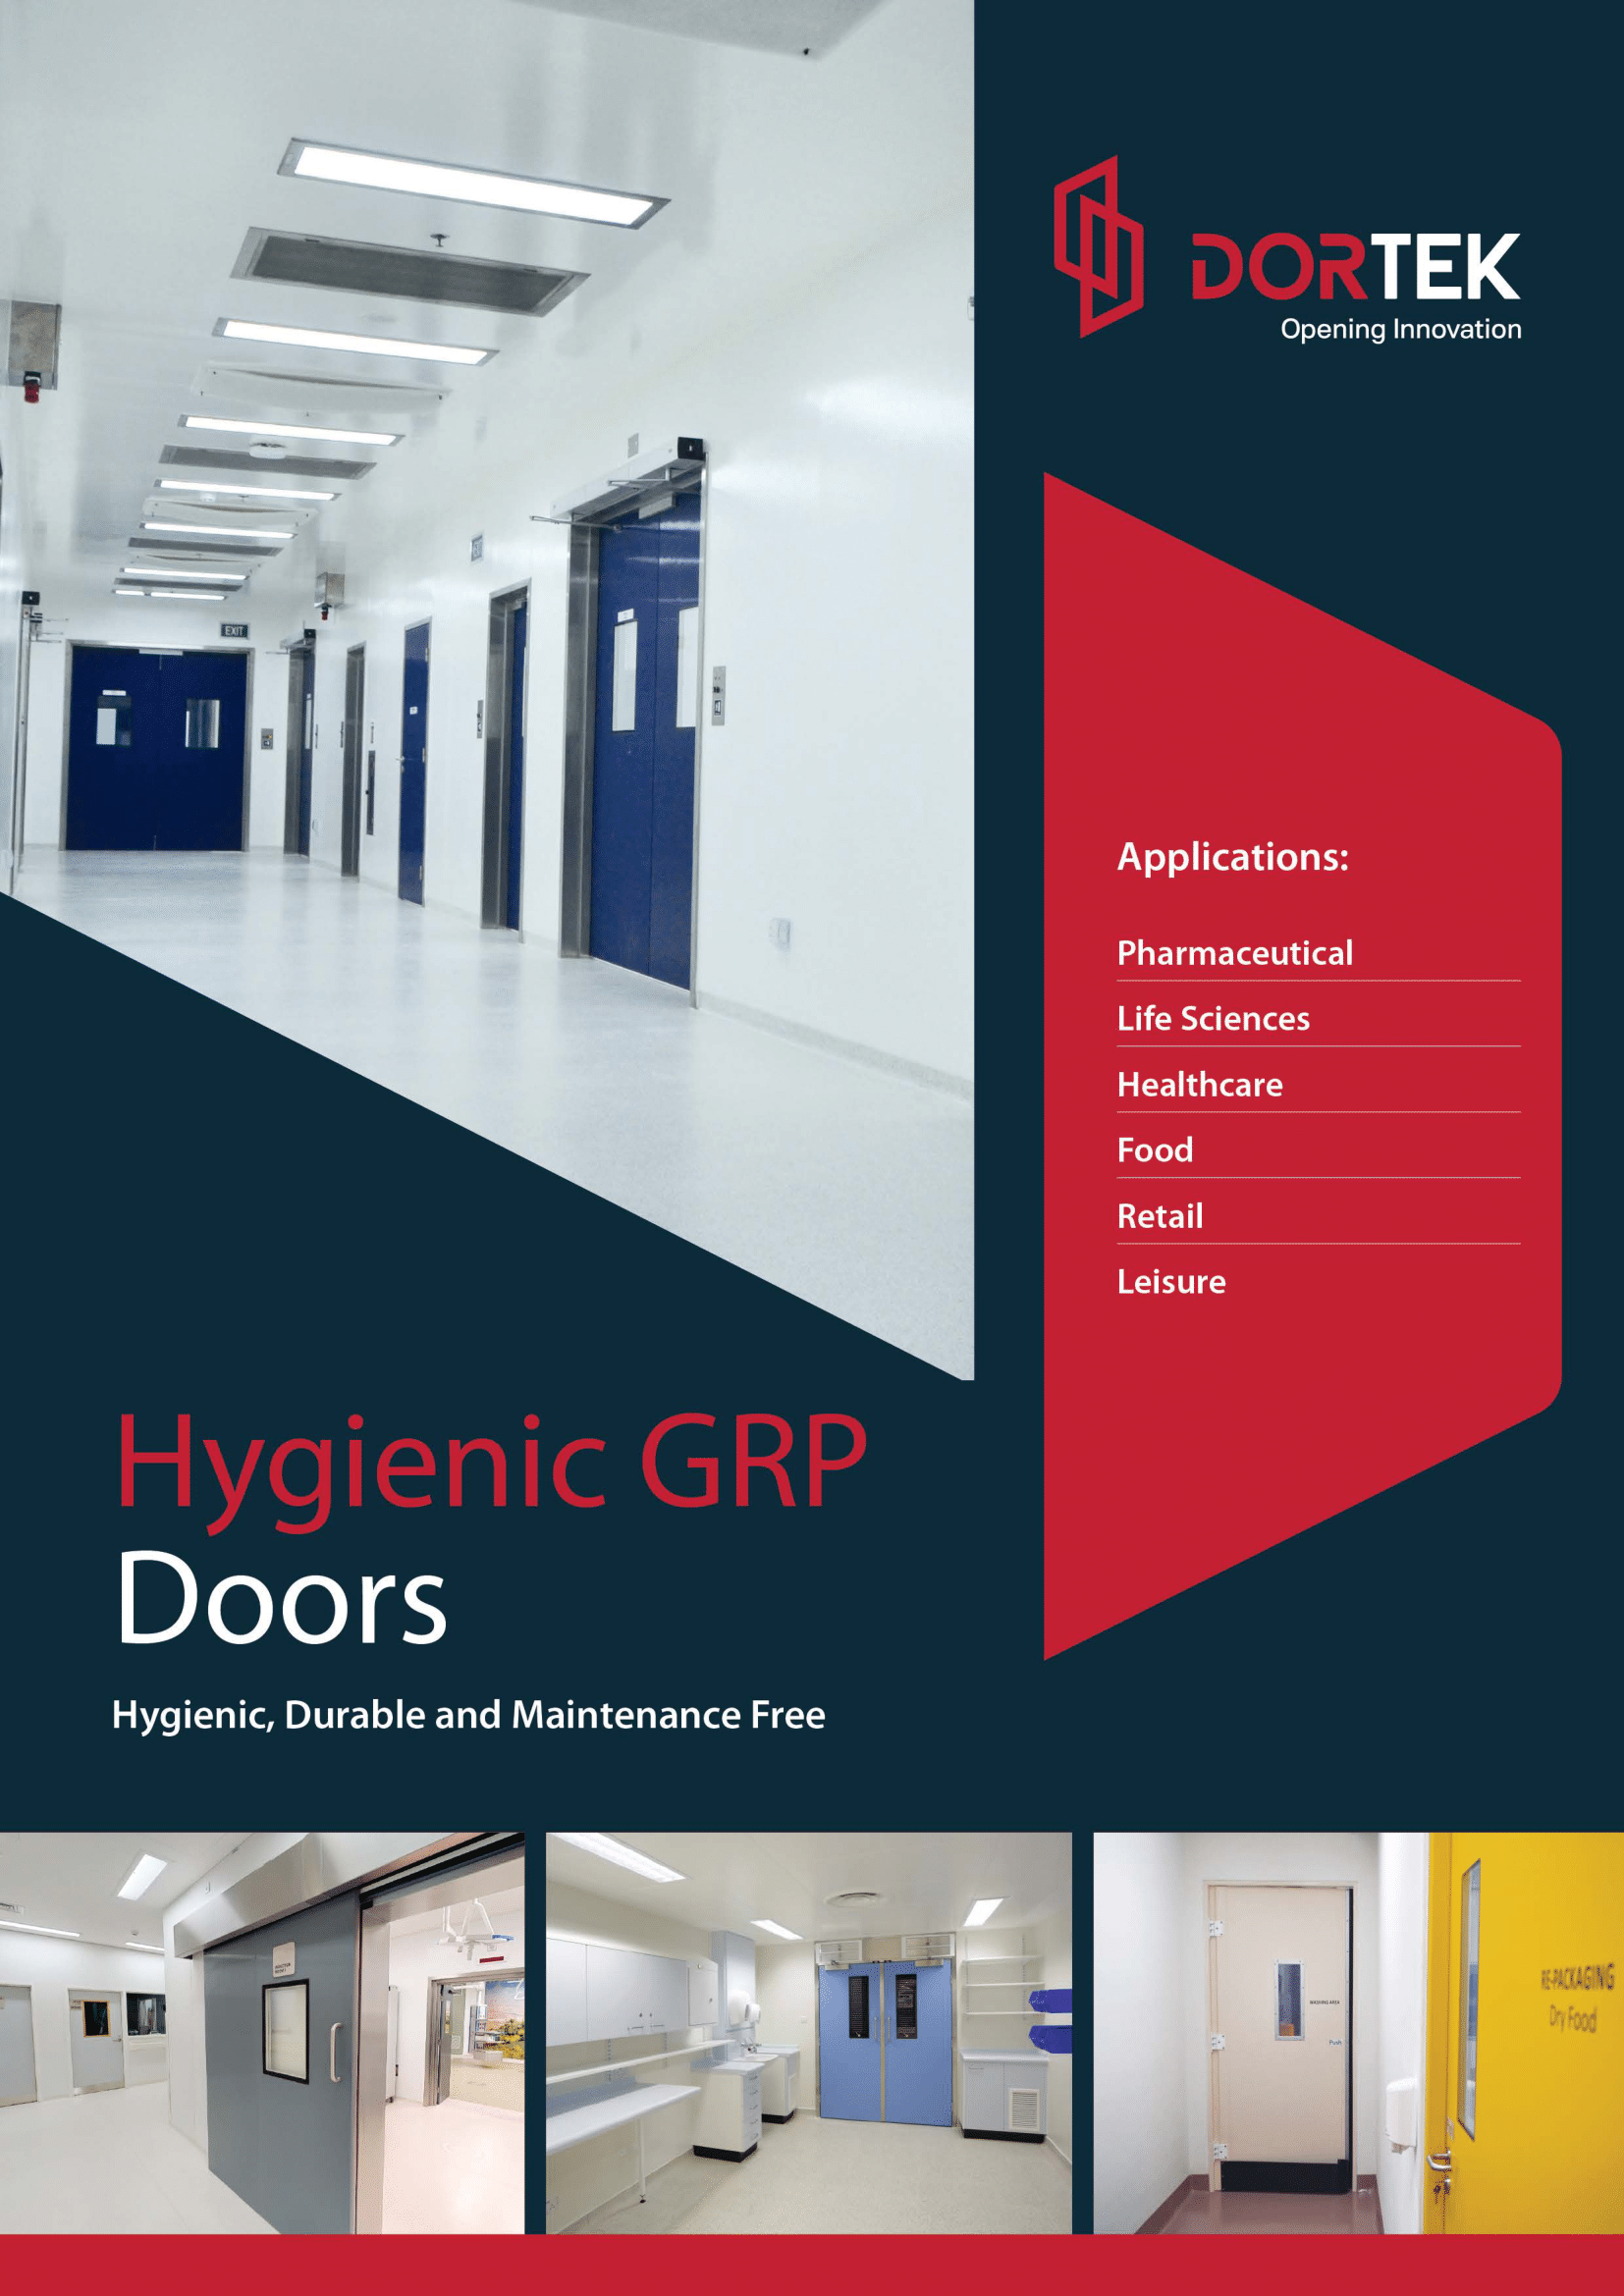 Hygienic GRP Doors Brochure